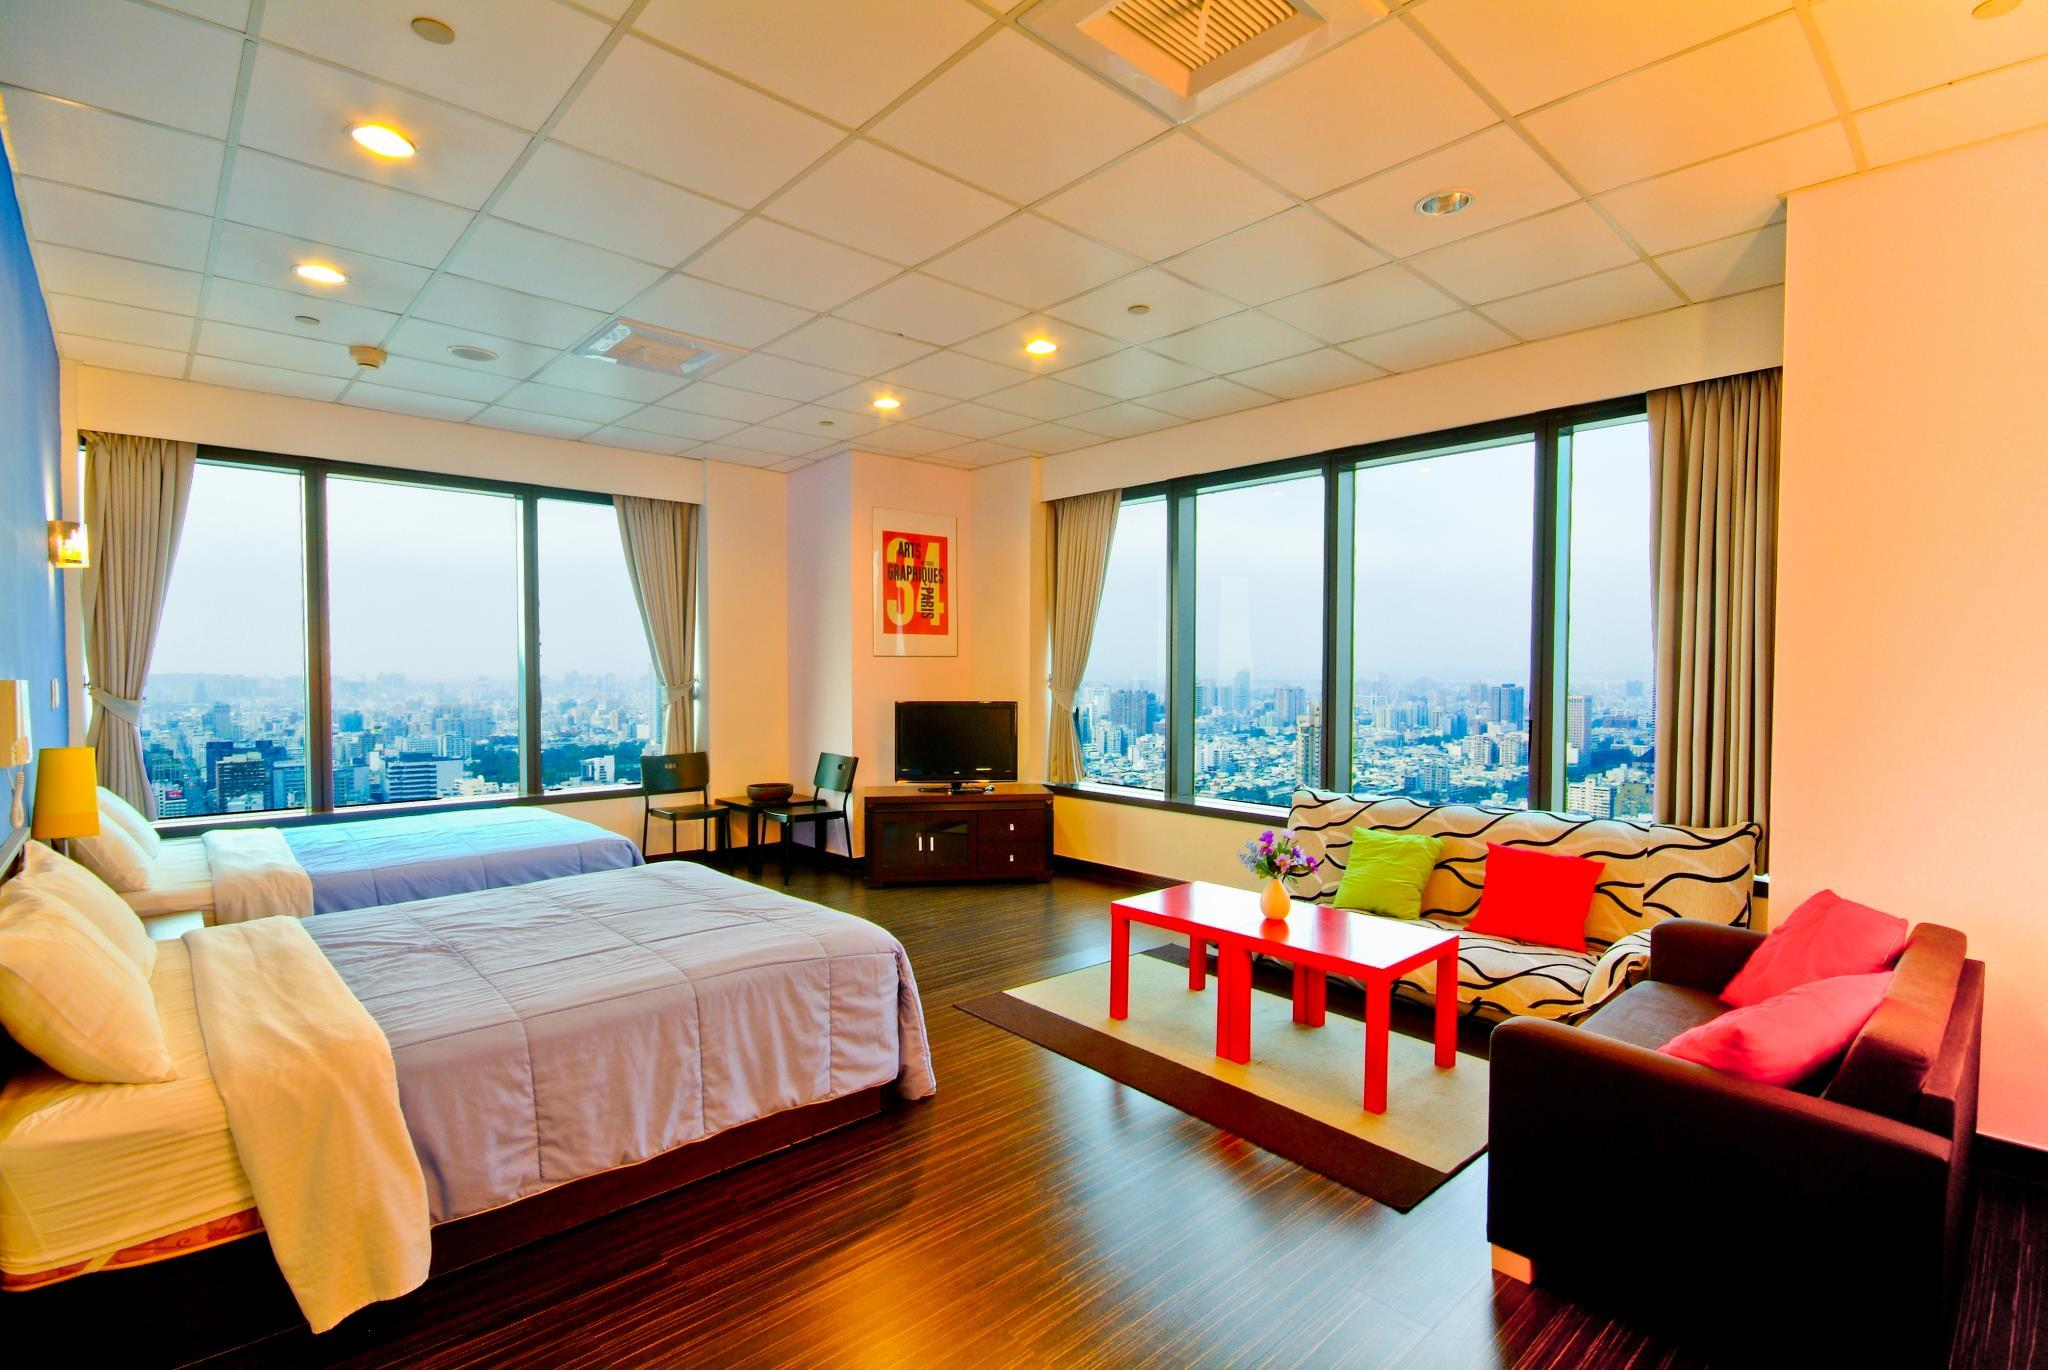 Sky City Business Hotel